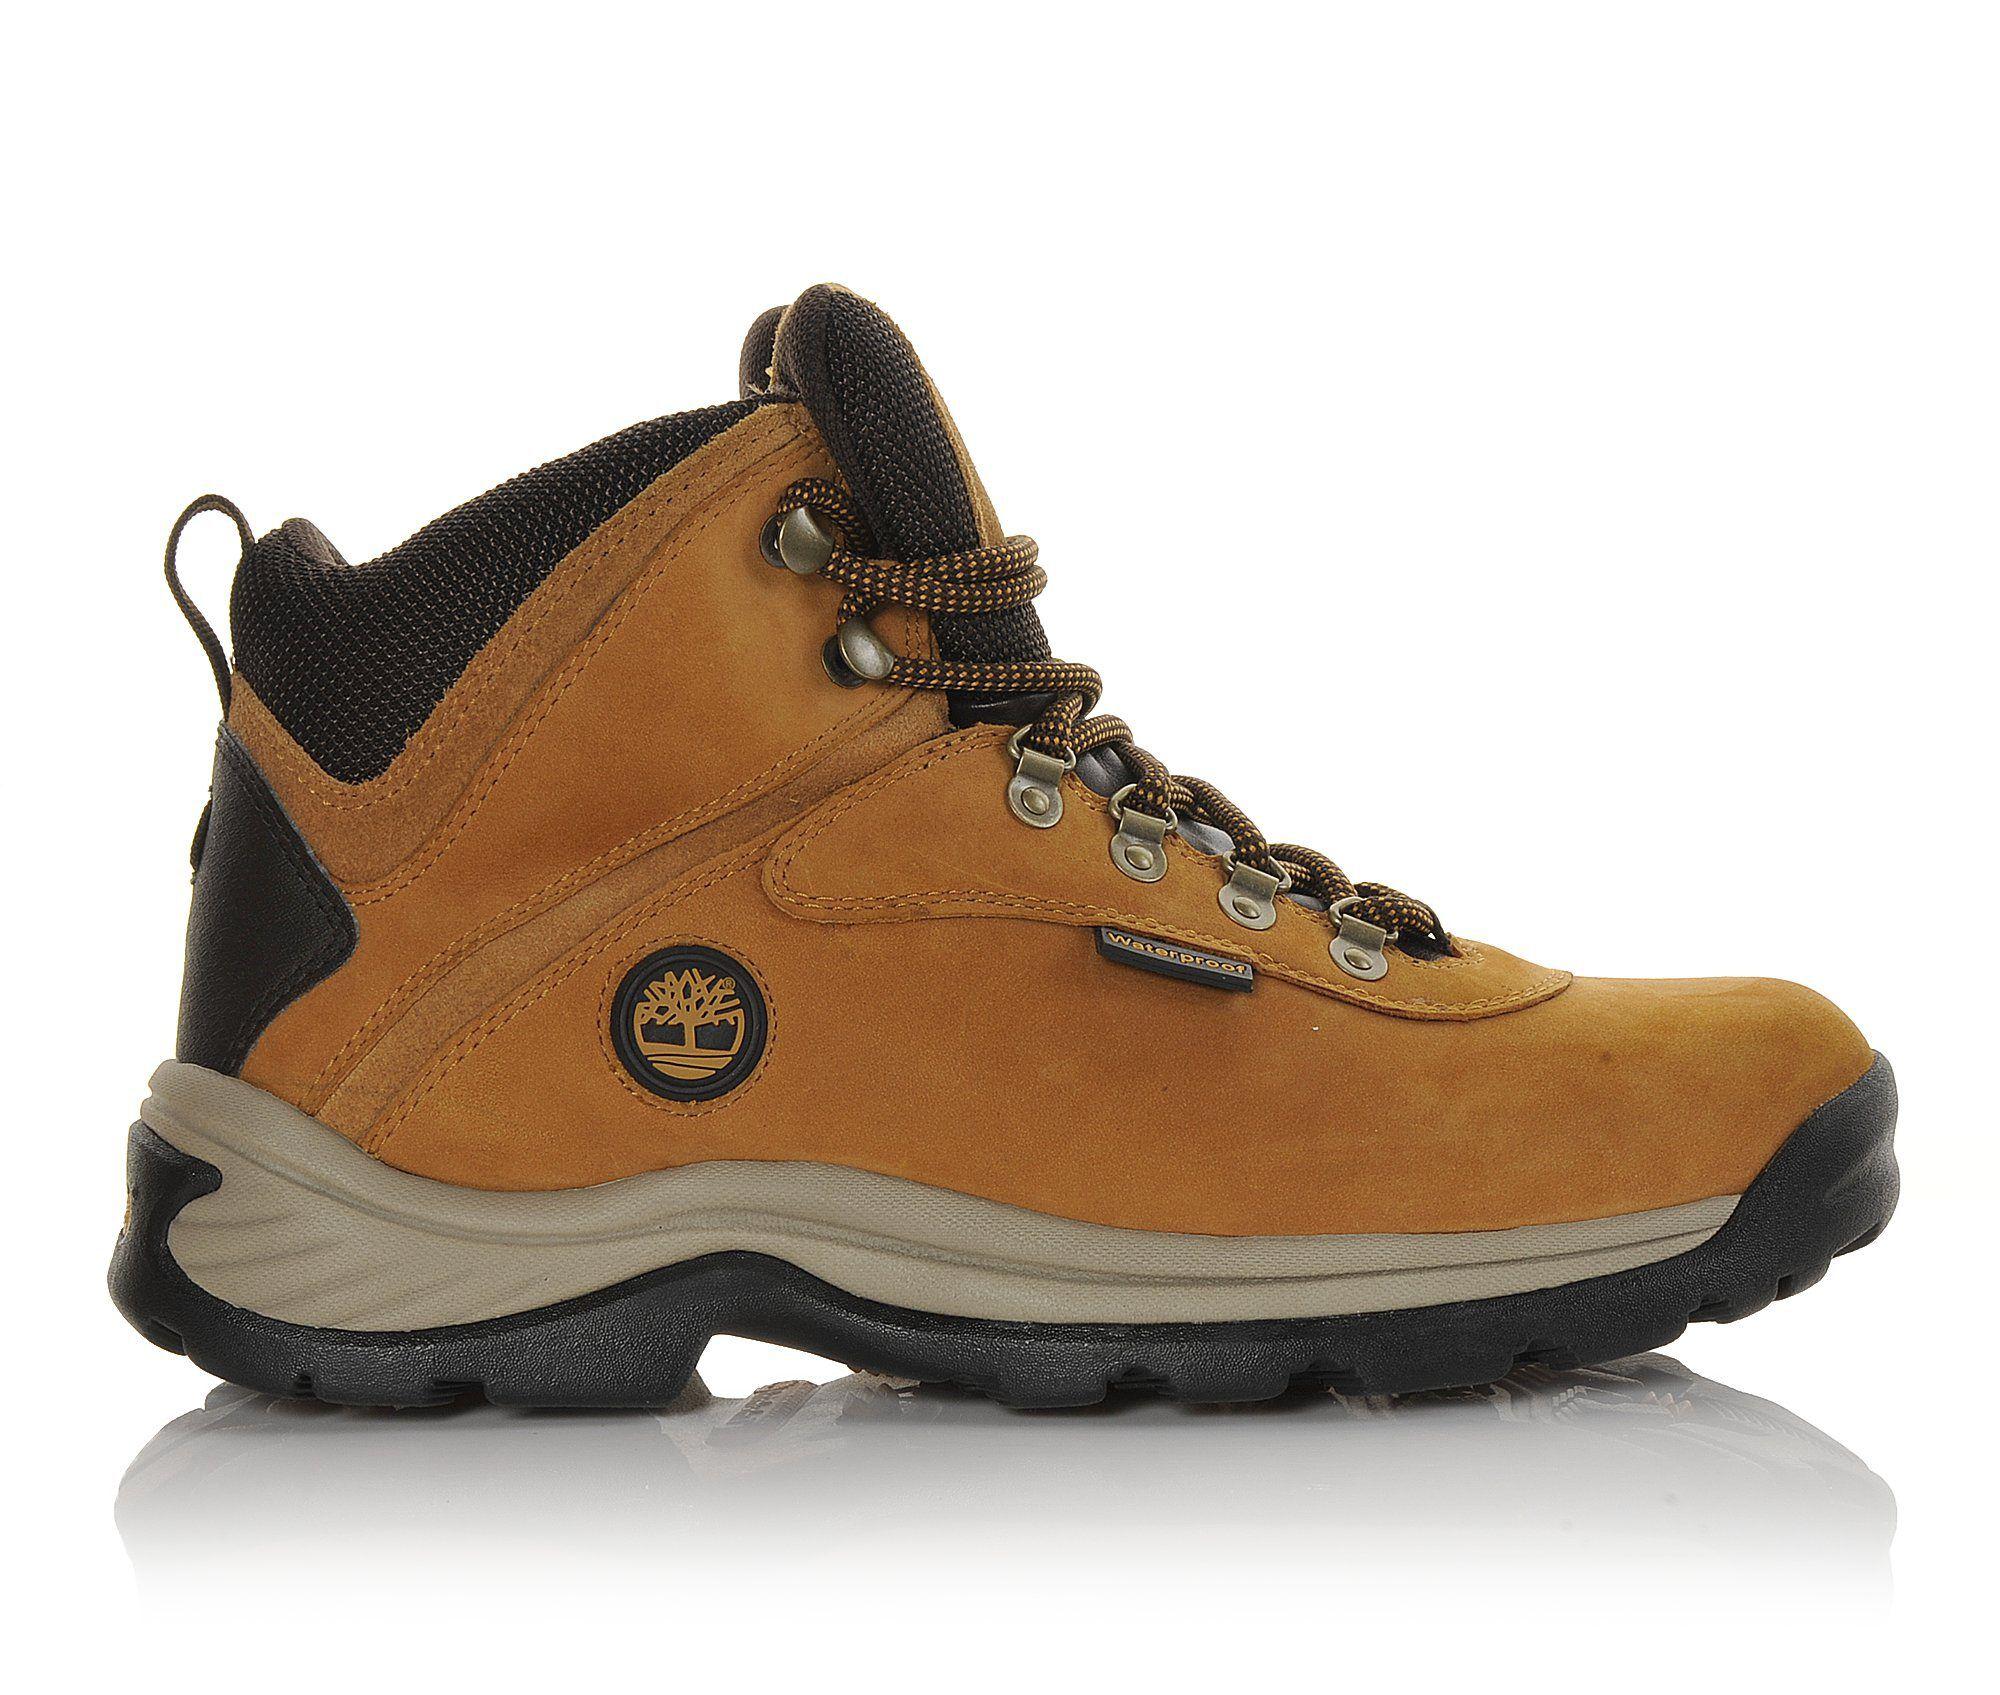 Men's Timberland White Ledge Waterproof Hiking Boots Wheat